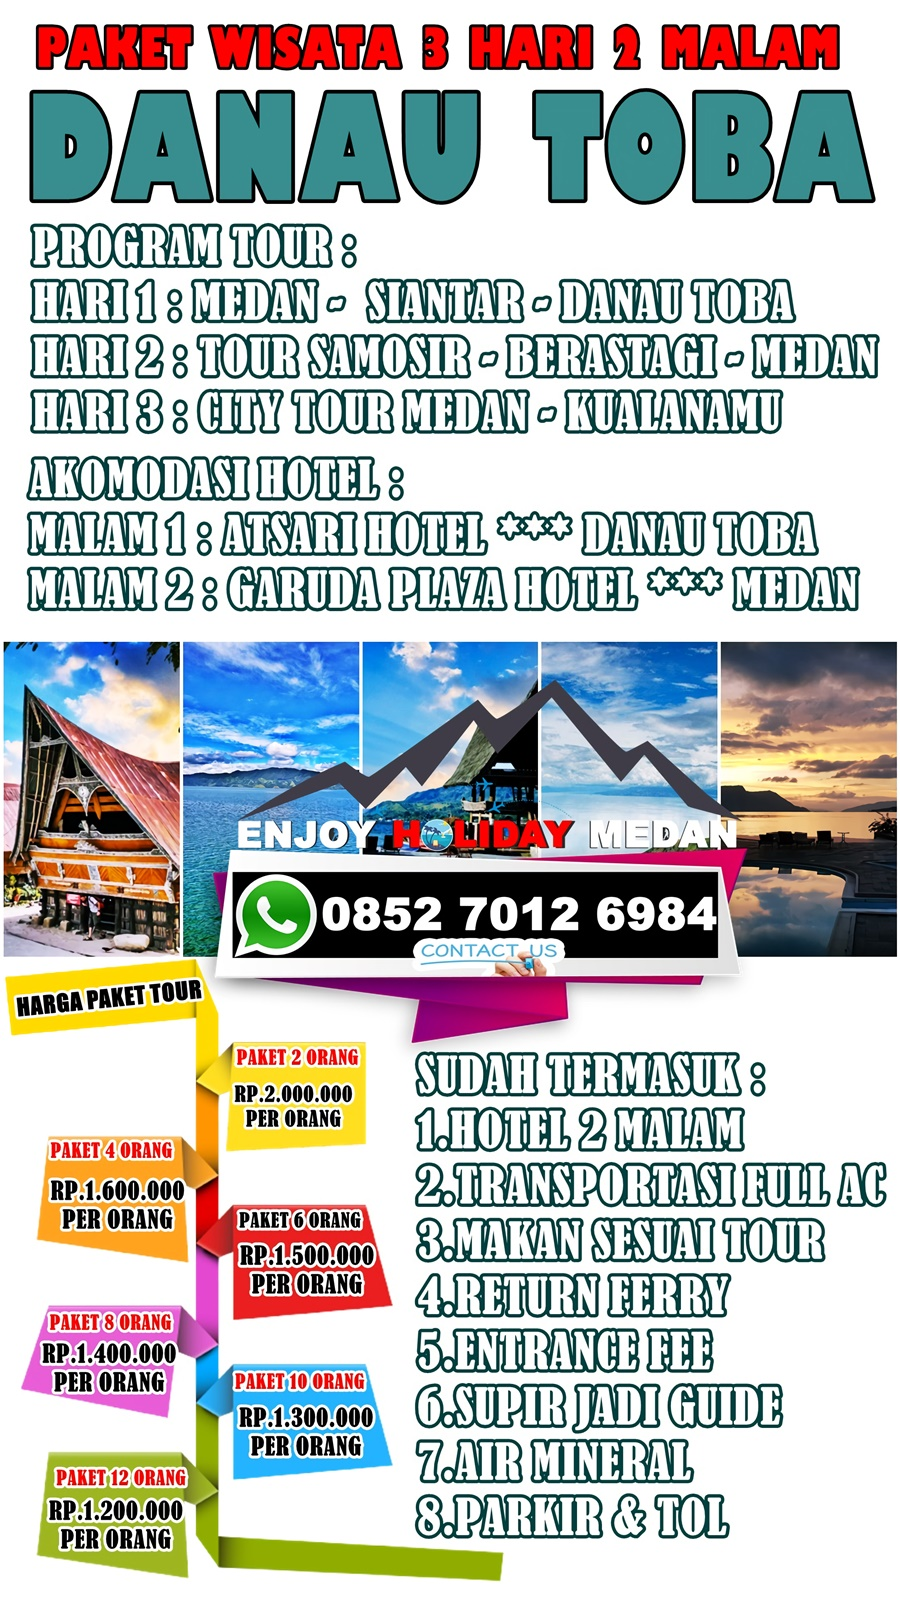 3H2M Paket Tour Medan Bukit Lawang